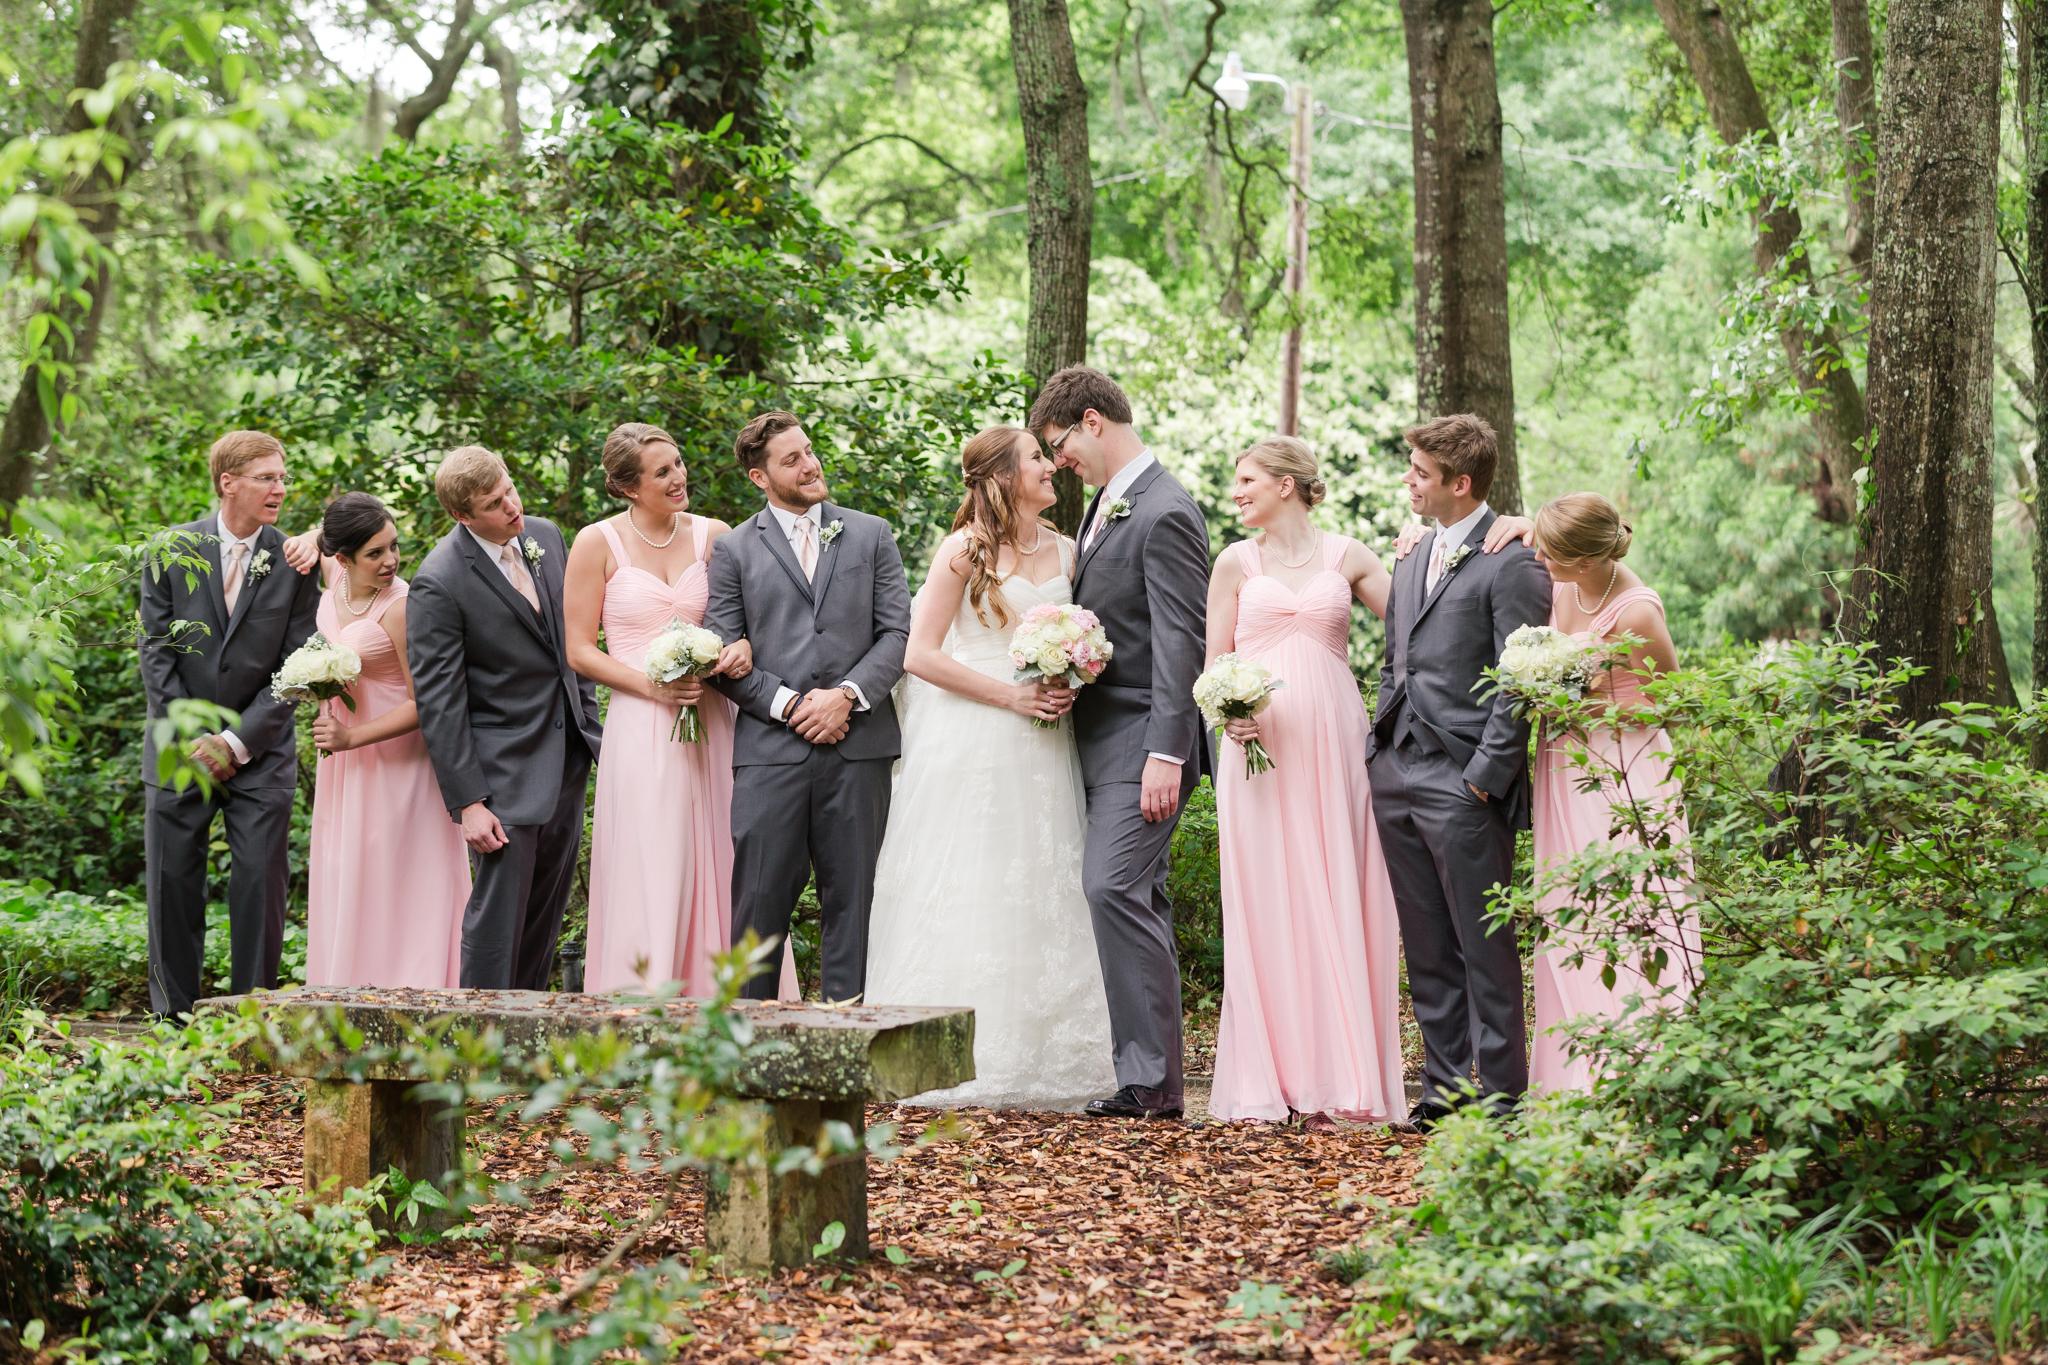 Ashley-Amber-Photo-Outdoor-Wedding-Photography-151423.jpg